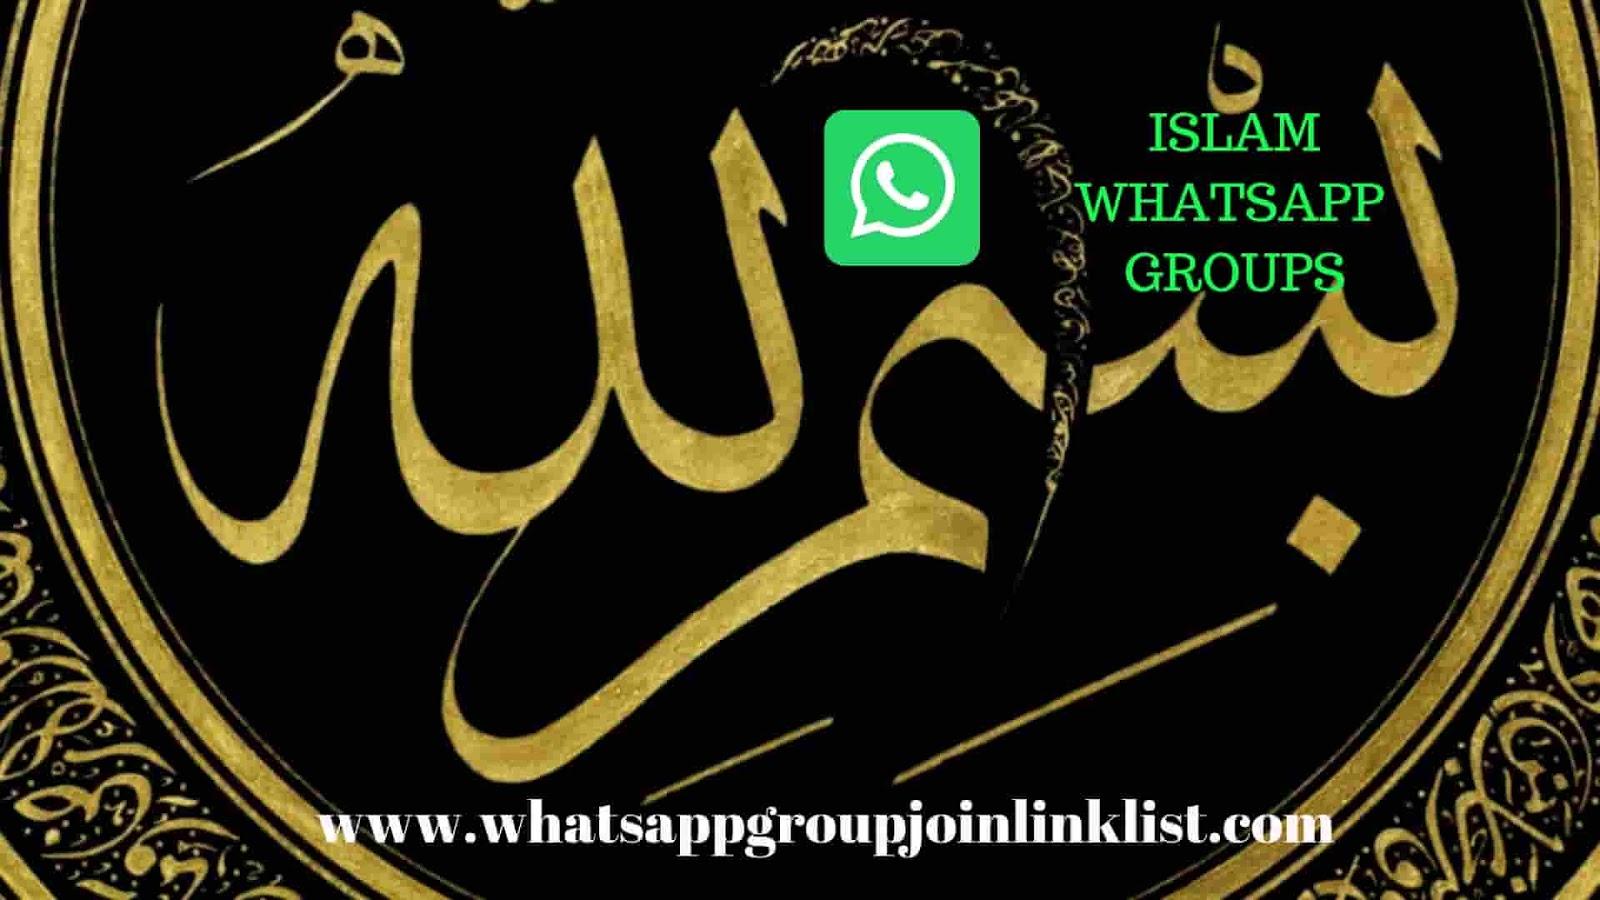 Qa whatsapp group link